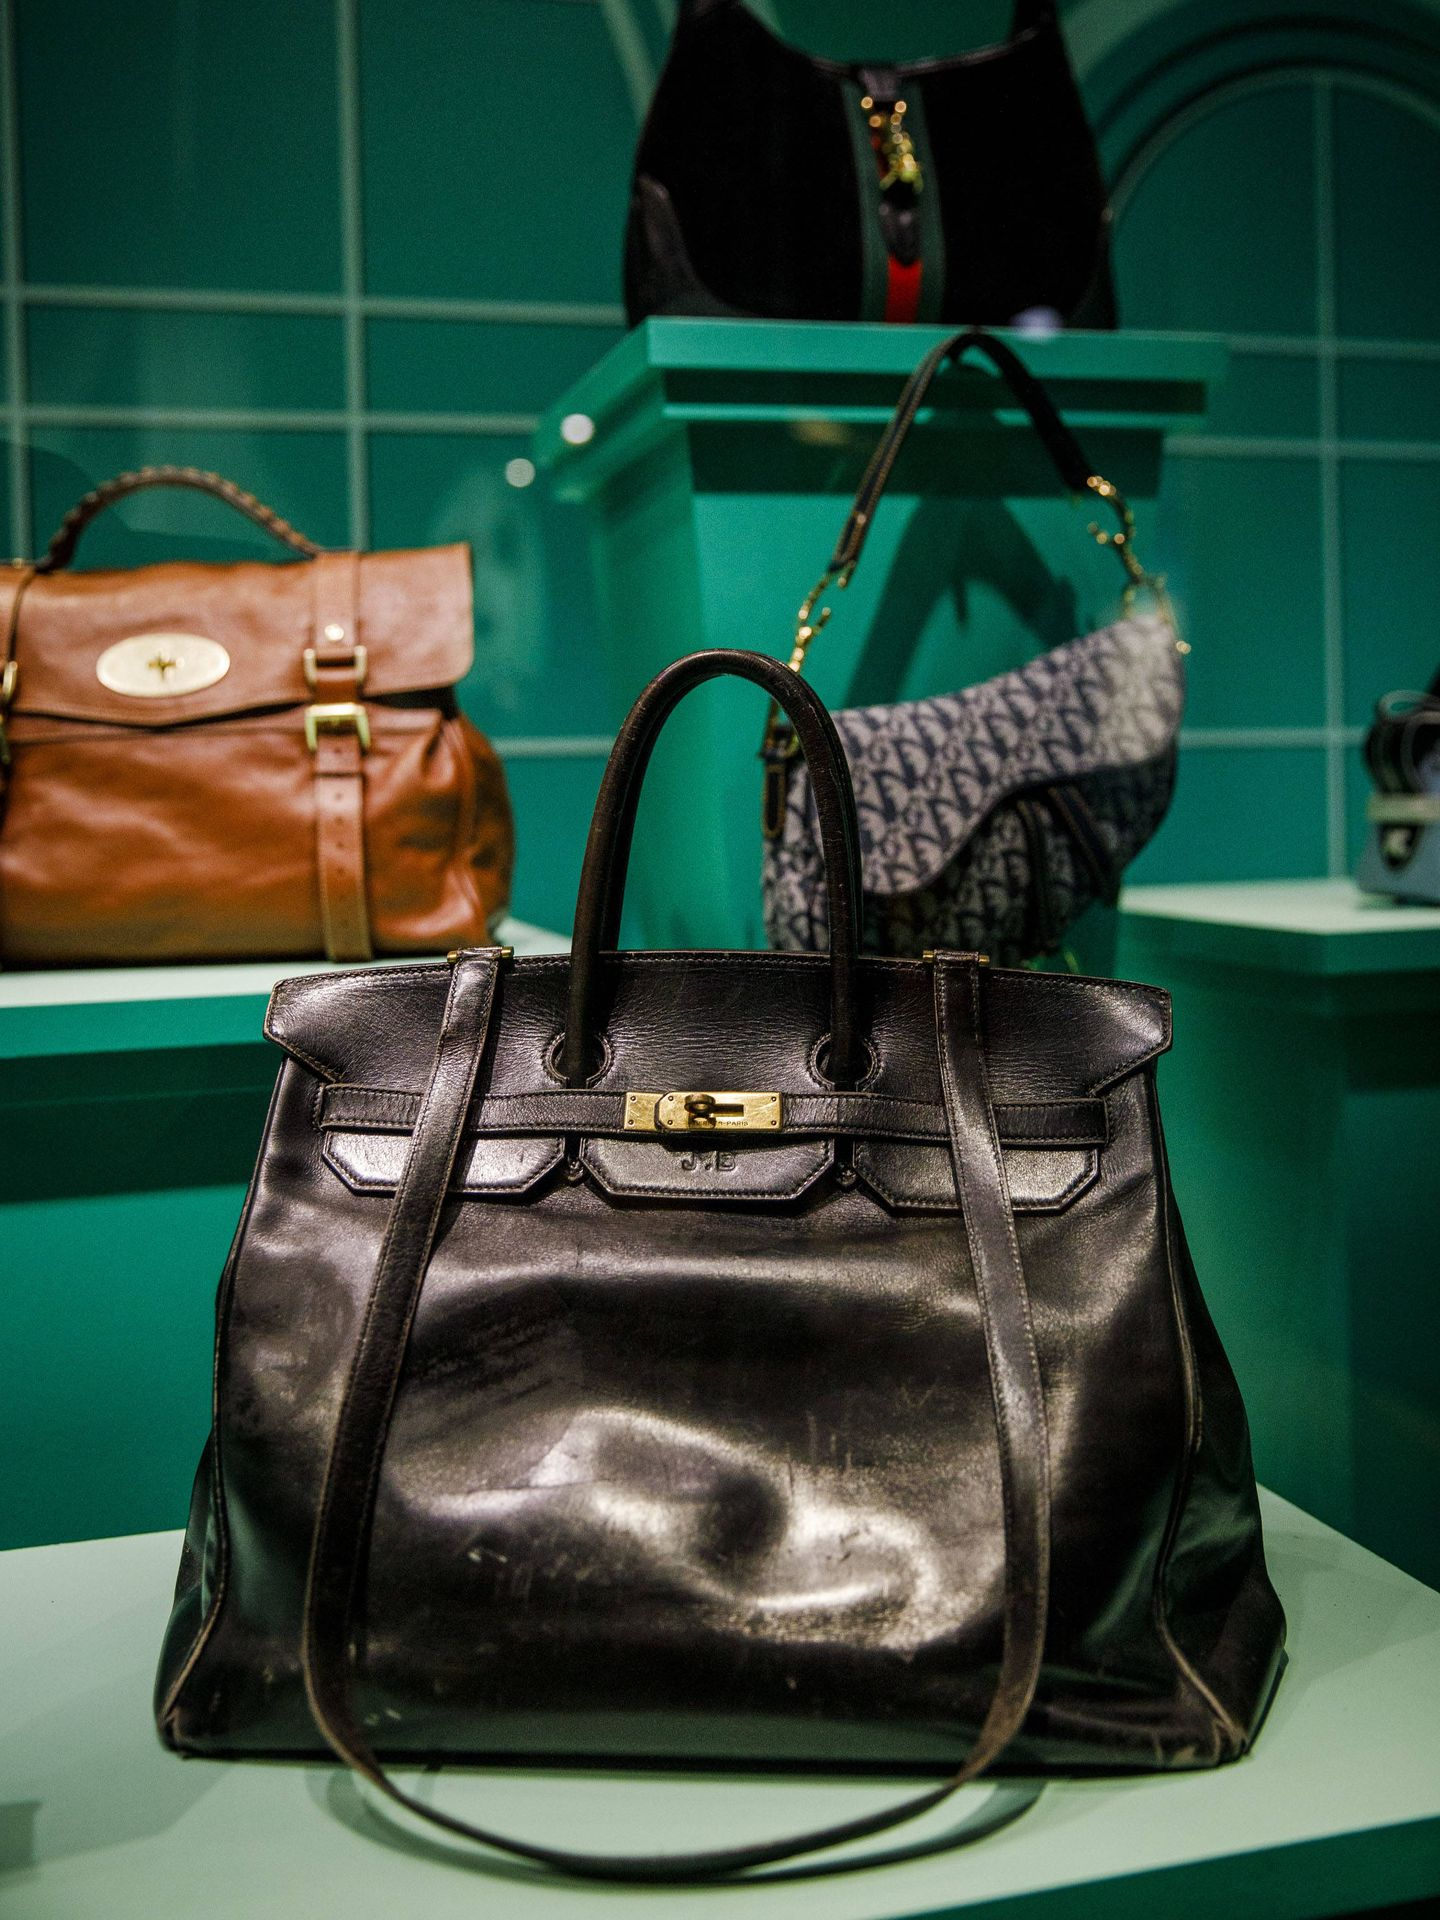 Imagen de la exposición 'Bags: Inside Out'.